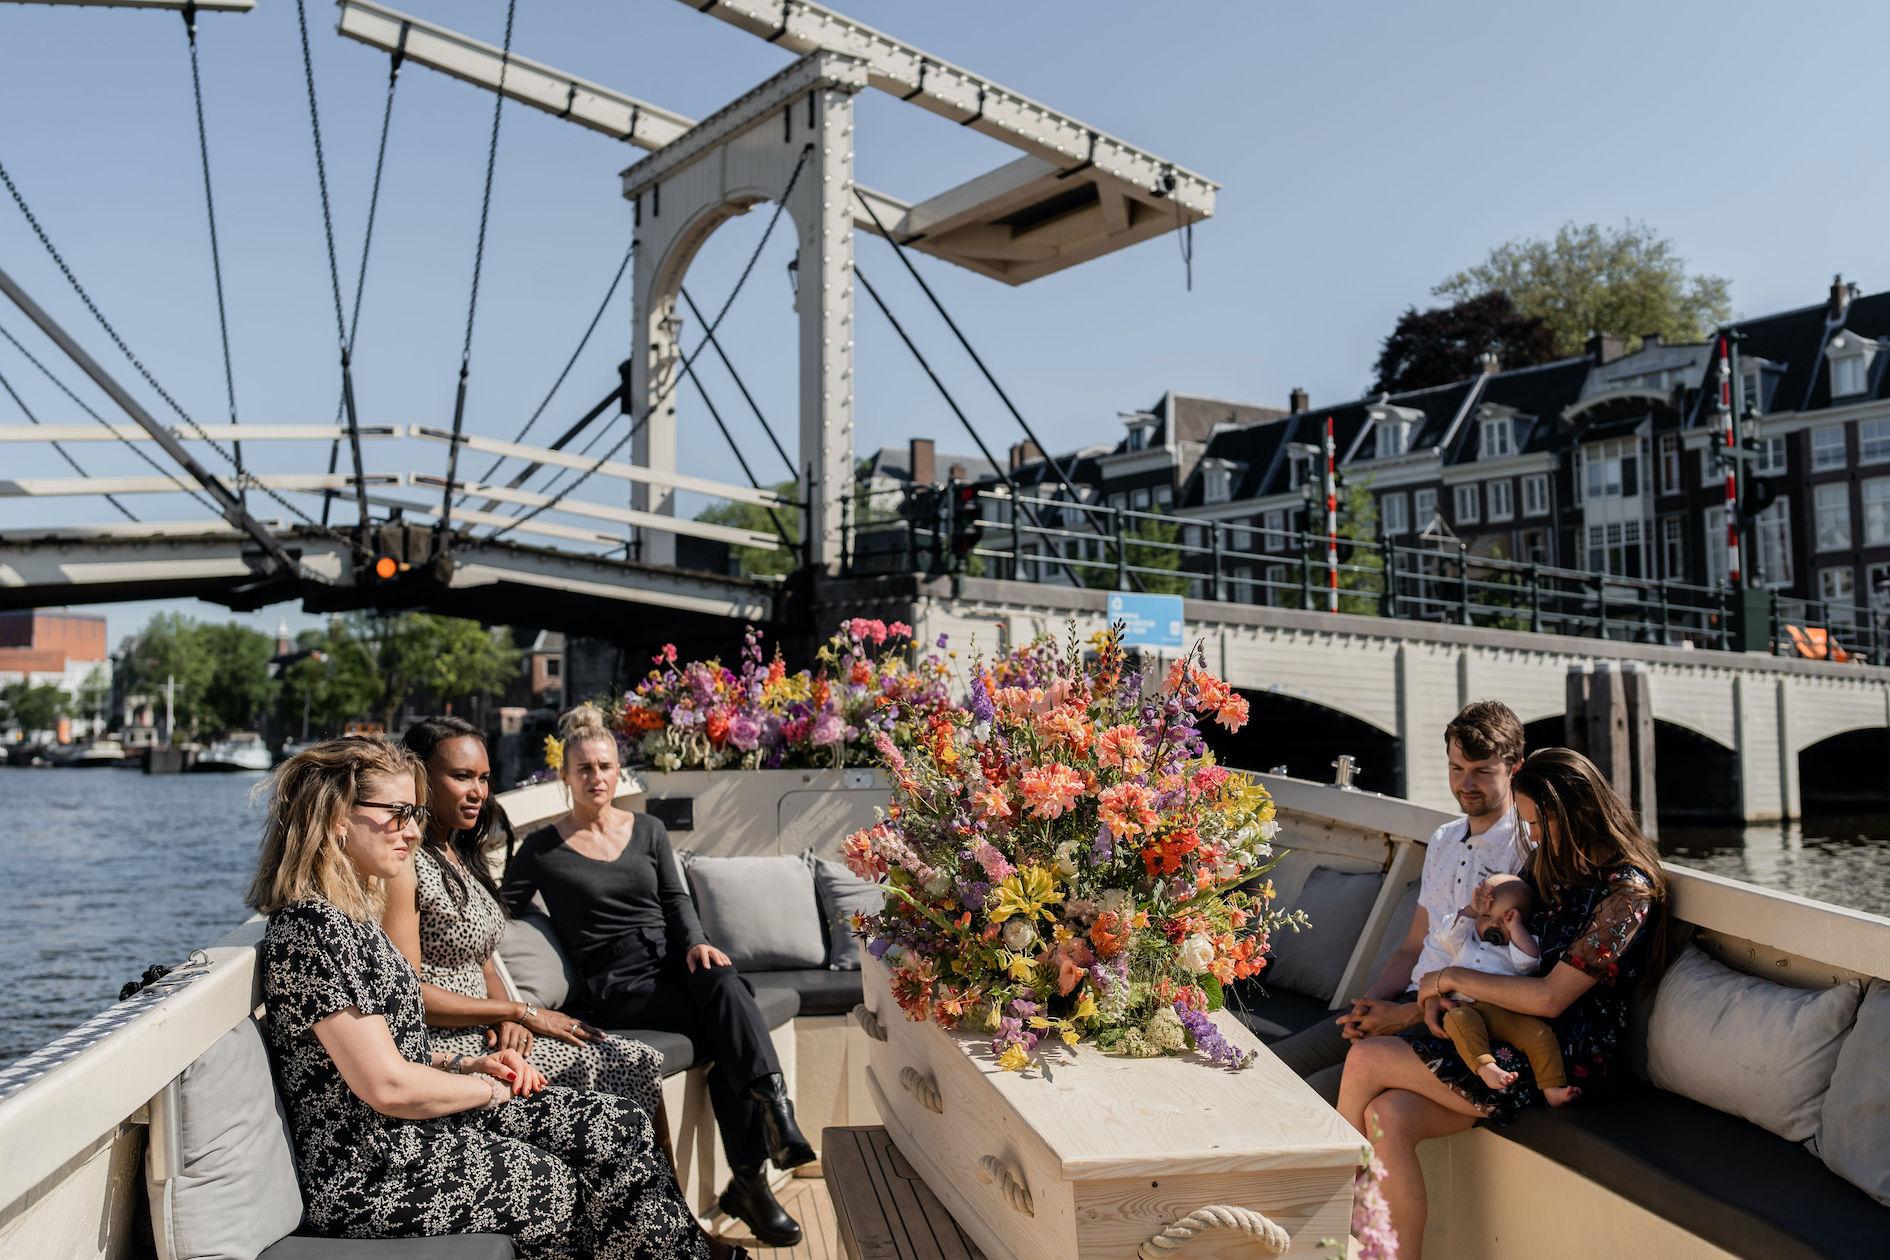 afscheid-magere-brug-amsterdam-boot-wateruitvaart-salonboot-amstel